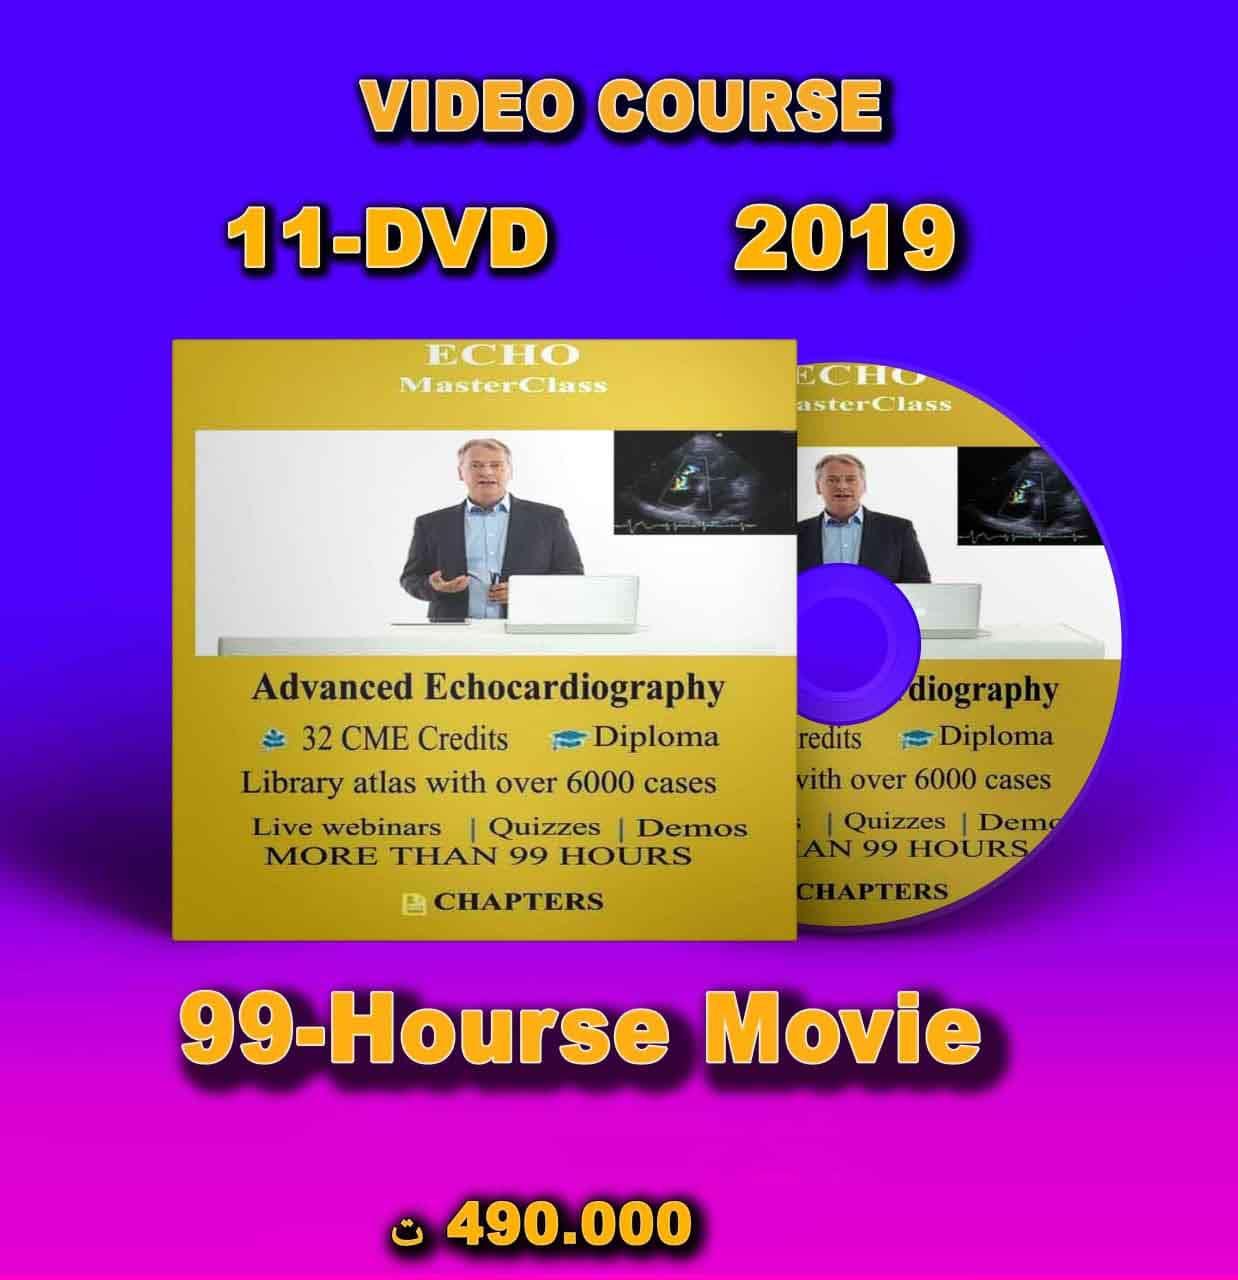 دانلود ECHO BACHELOR CLASS  ADVANCED ECHOCARDIOGRAPHY (video course)